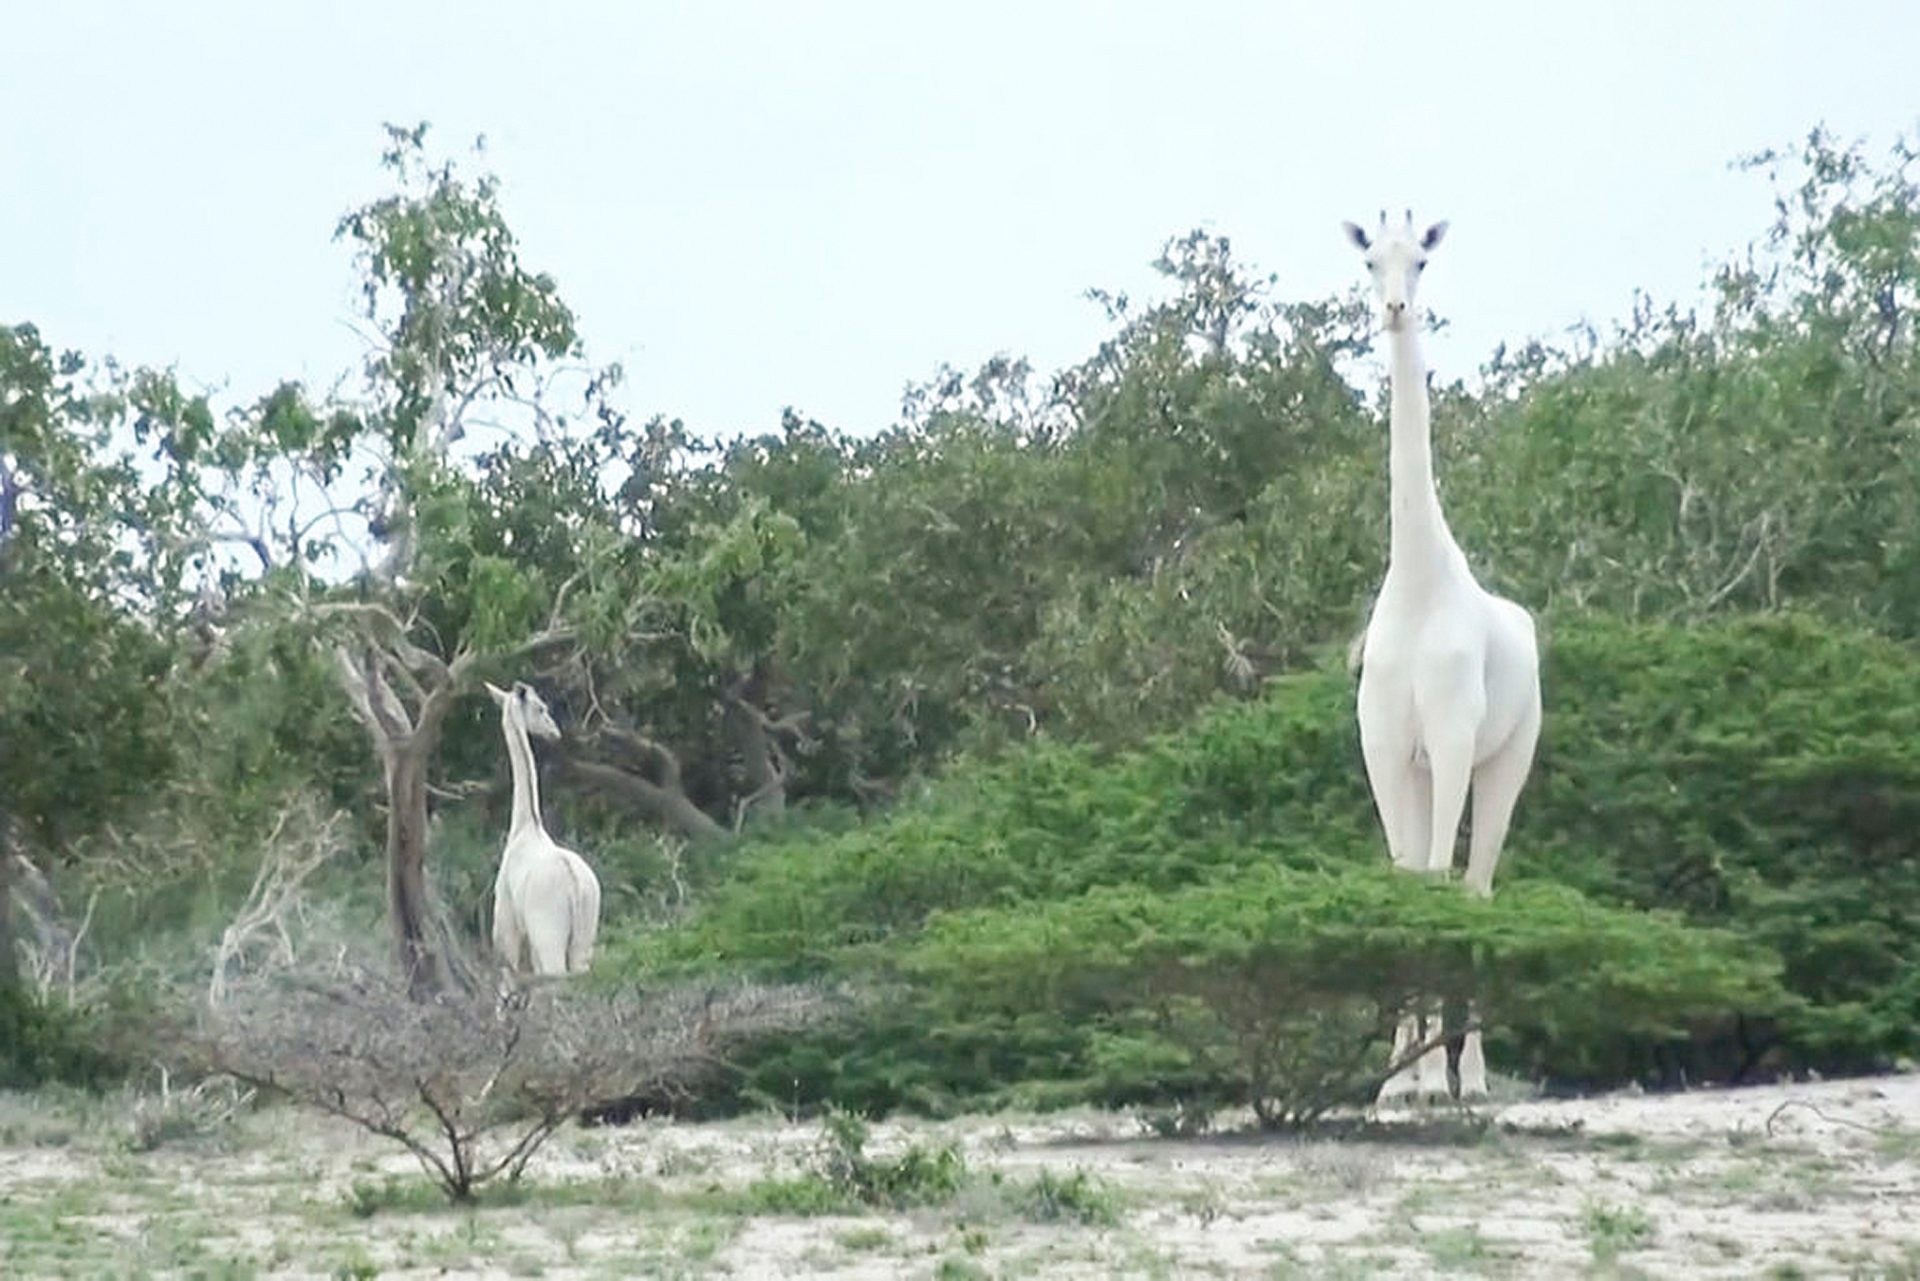 Weiße Giraffe mit Kalb am Fluss in Kenia